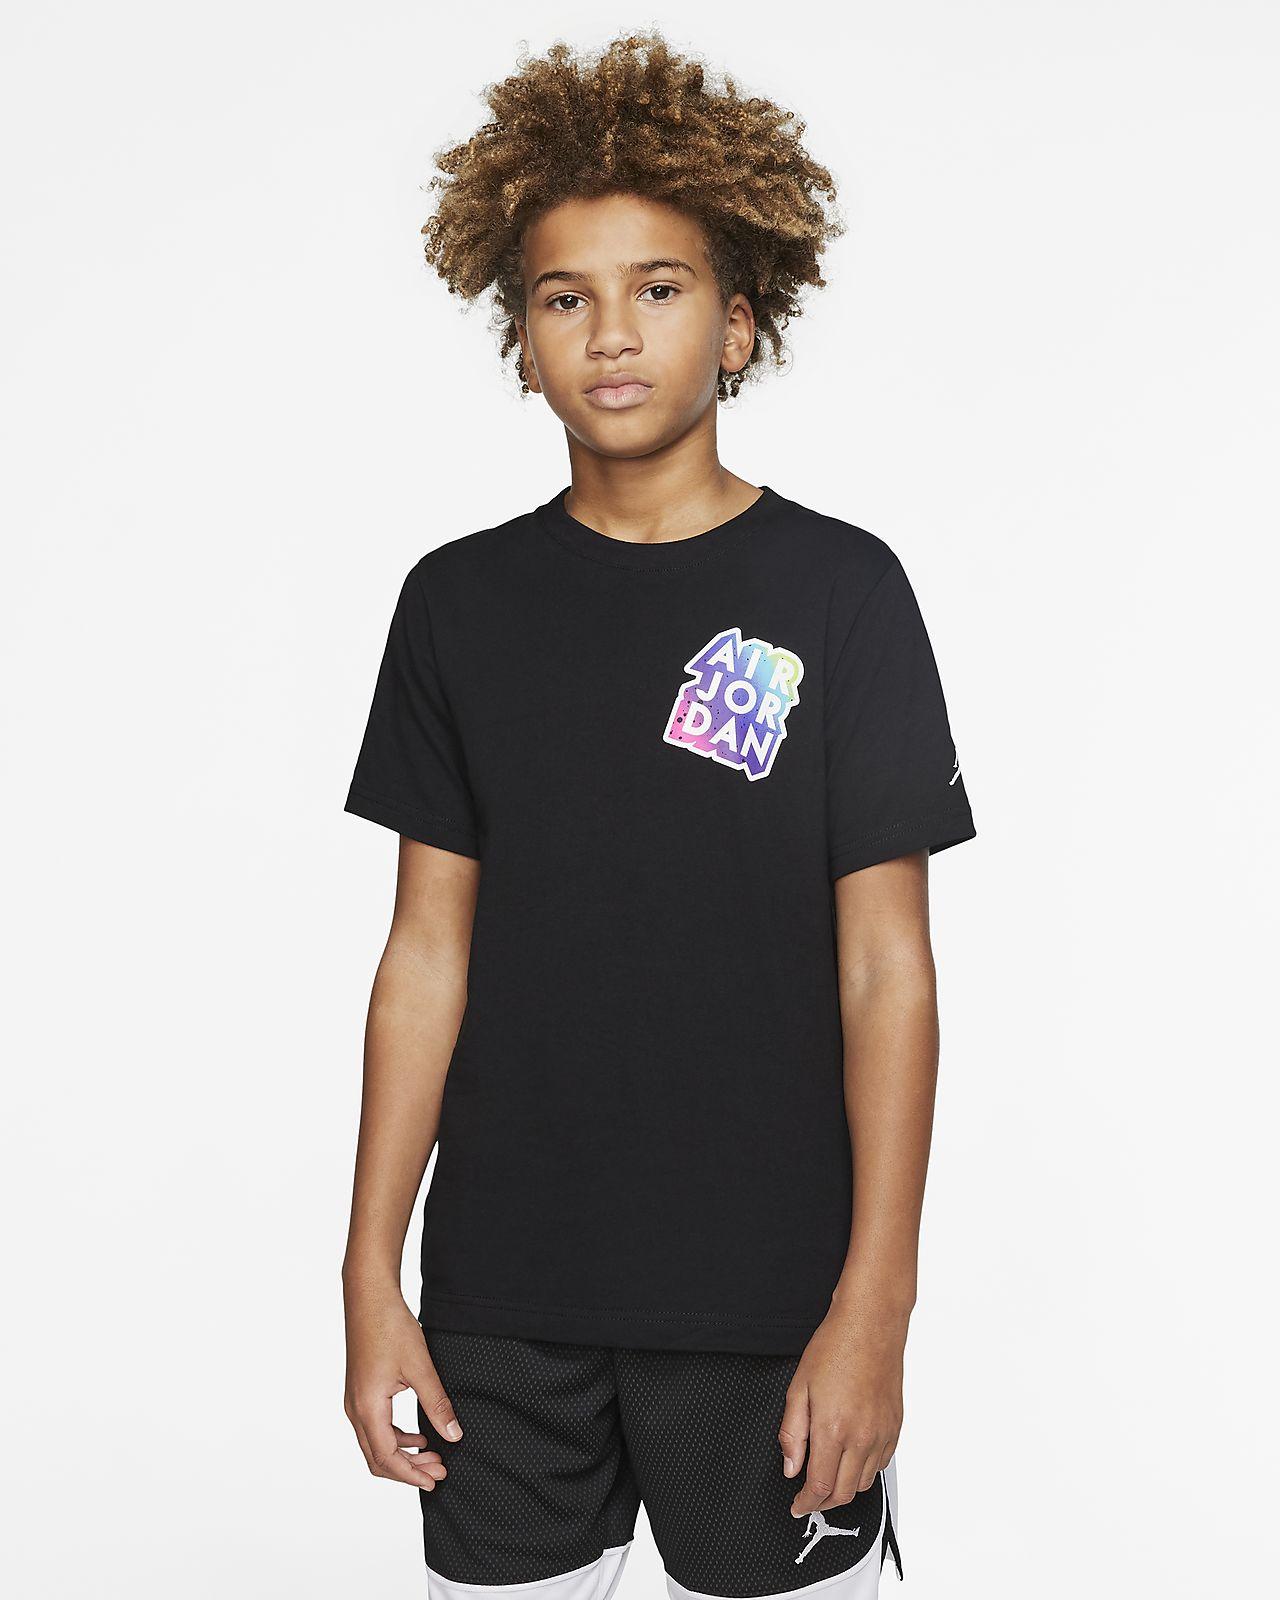 Air Jordan Big Kids' (Boys') Short-Sleeve T-Shirt